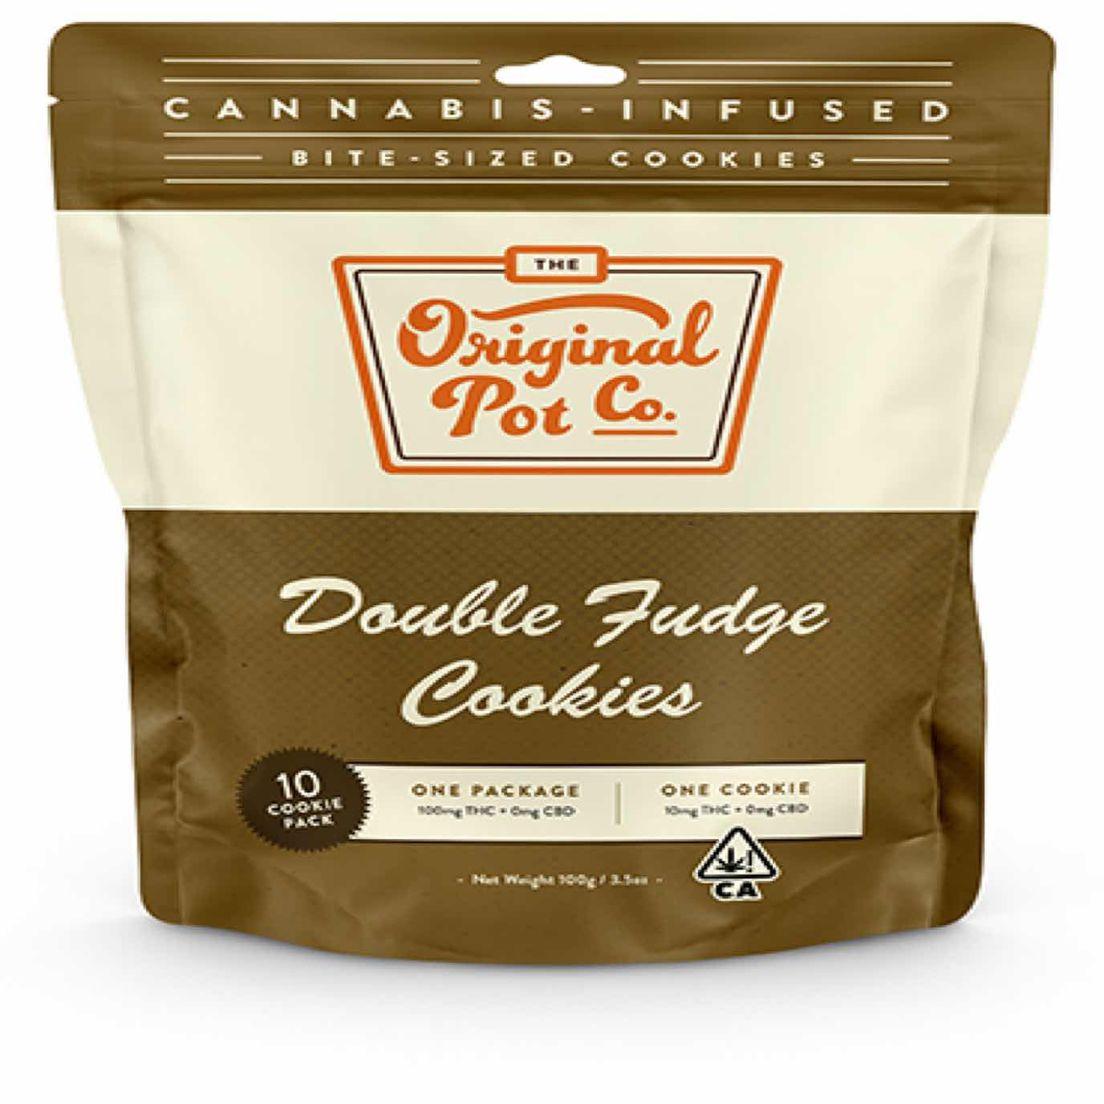 (PRE-ORDER ONLY) Double Fudge Cookies (100mg) - Original Pot Co.